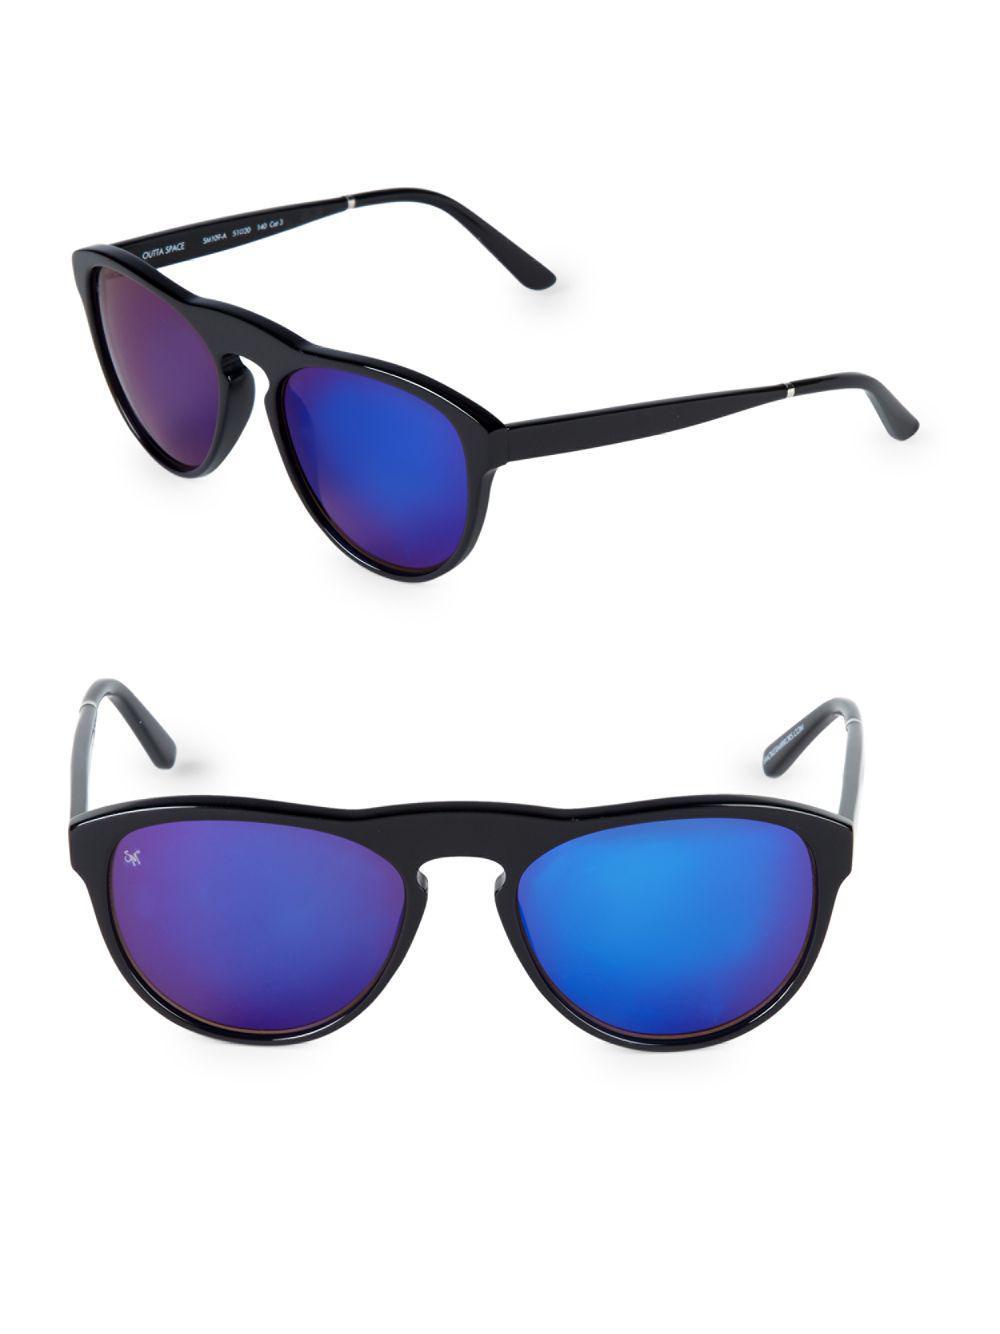 1262b44d28 Lyst - Smoke X Mirrors Outta Space 51mm Cat-eye Sunglasses in Blue ...